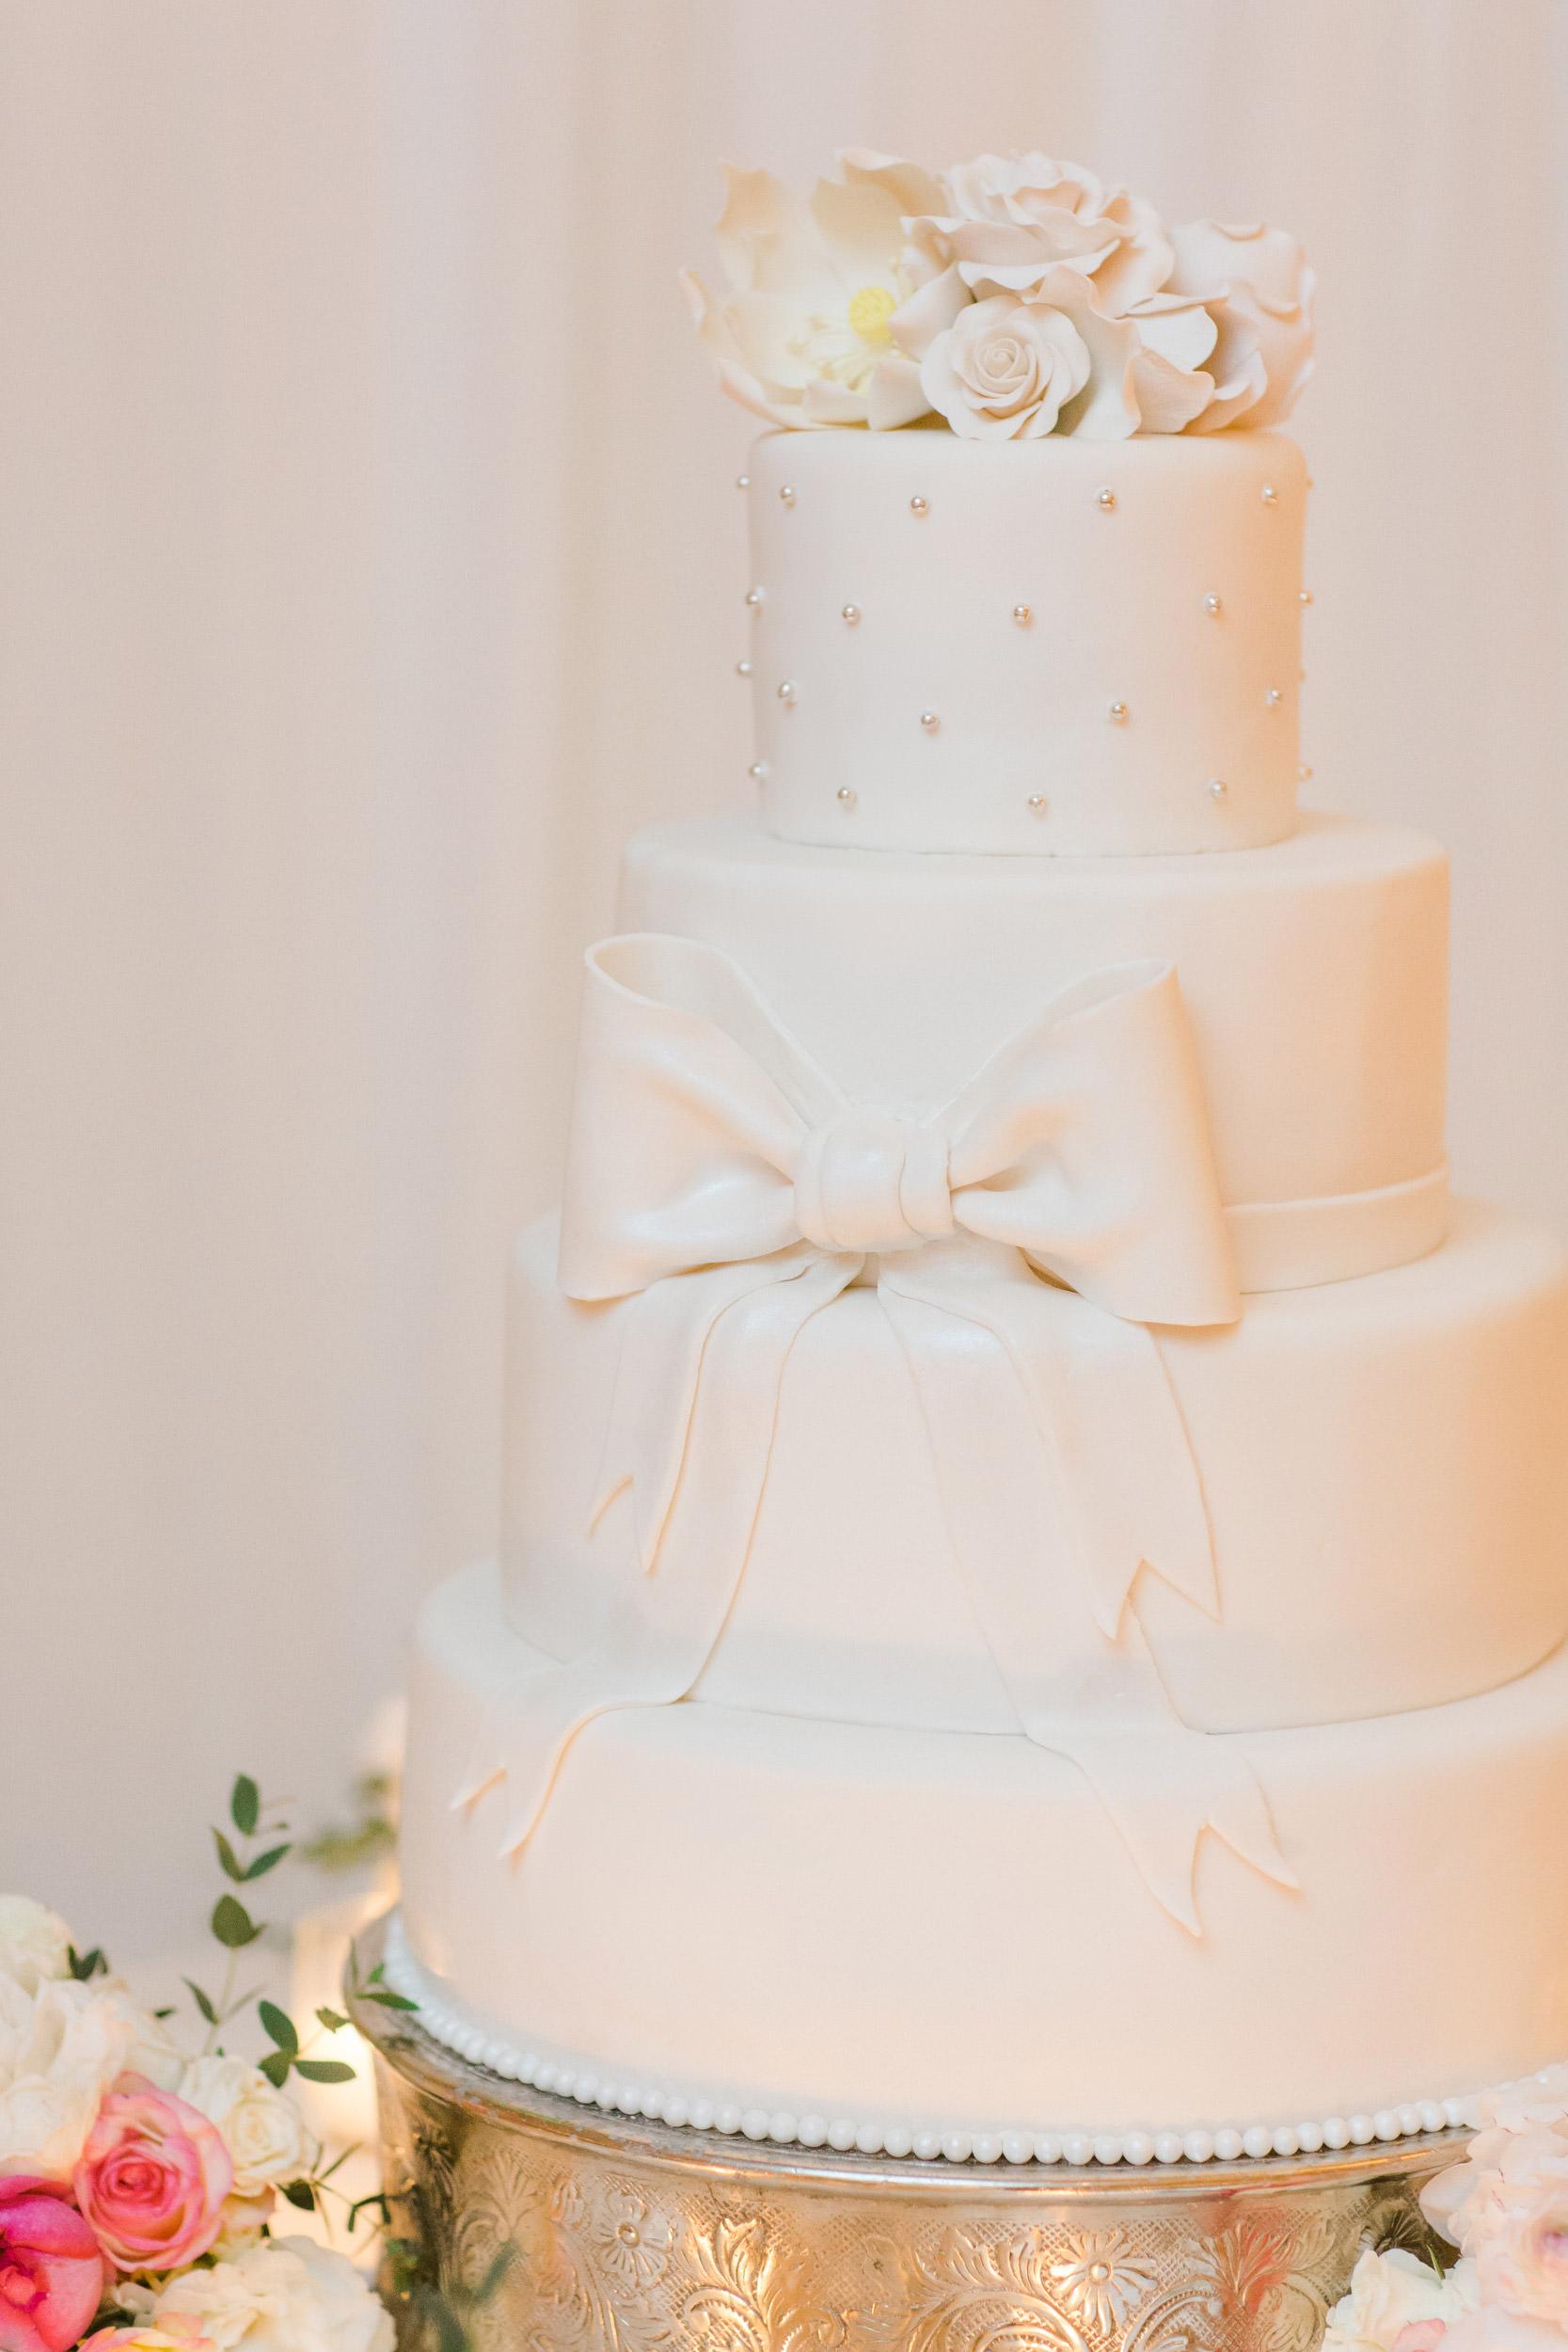 biltmore_santa_barbara_wedding_photos_coral_casino_046.jpg